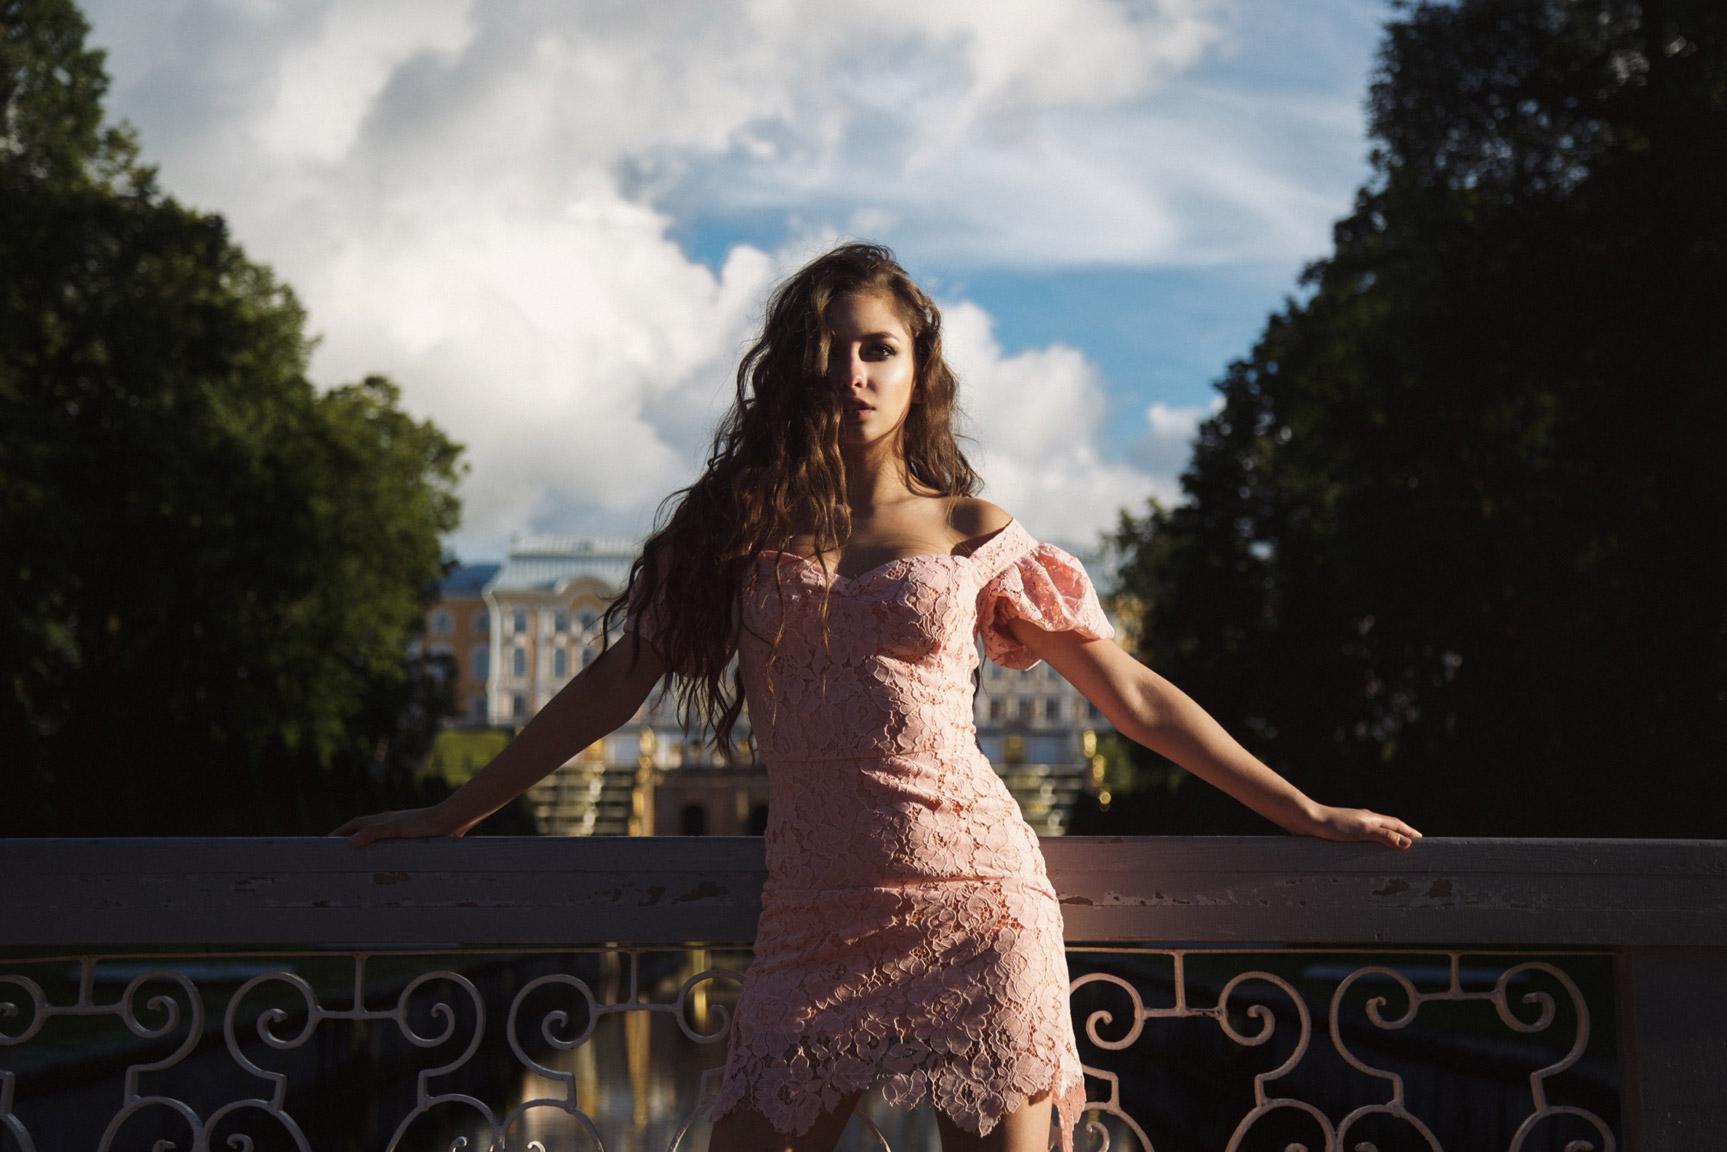 Darina Dashkina by Sergey Korolkov